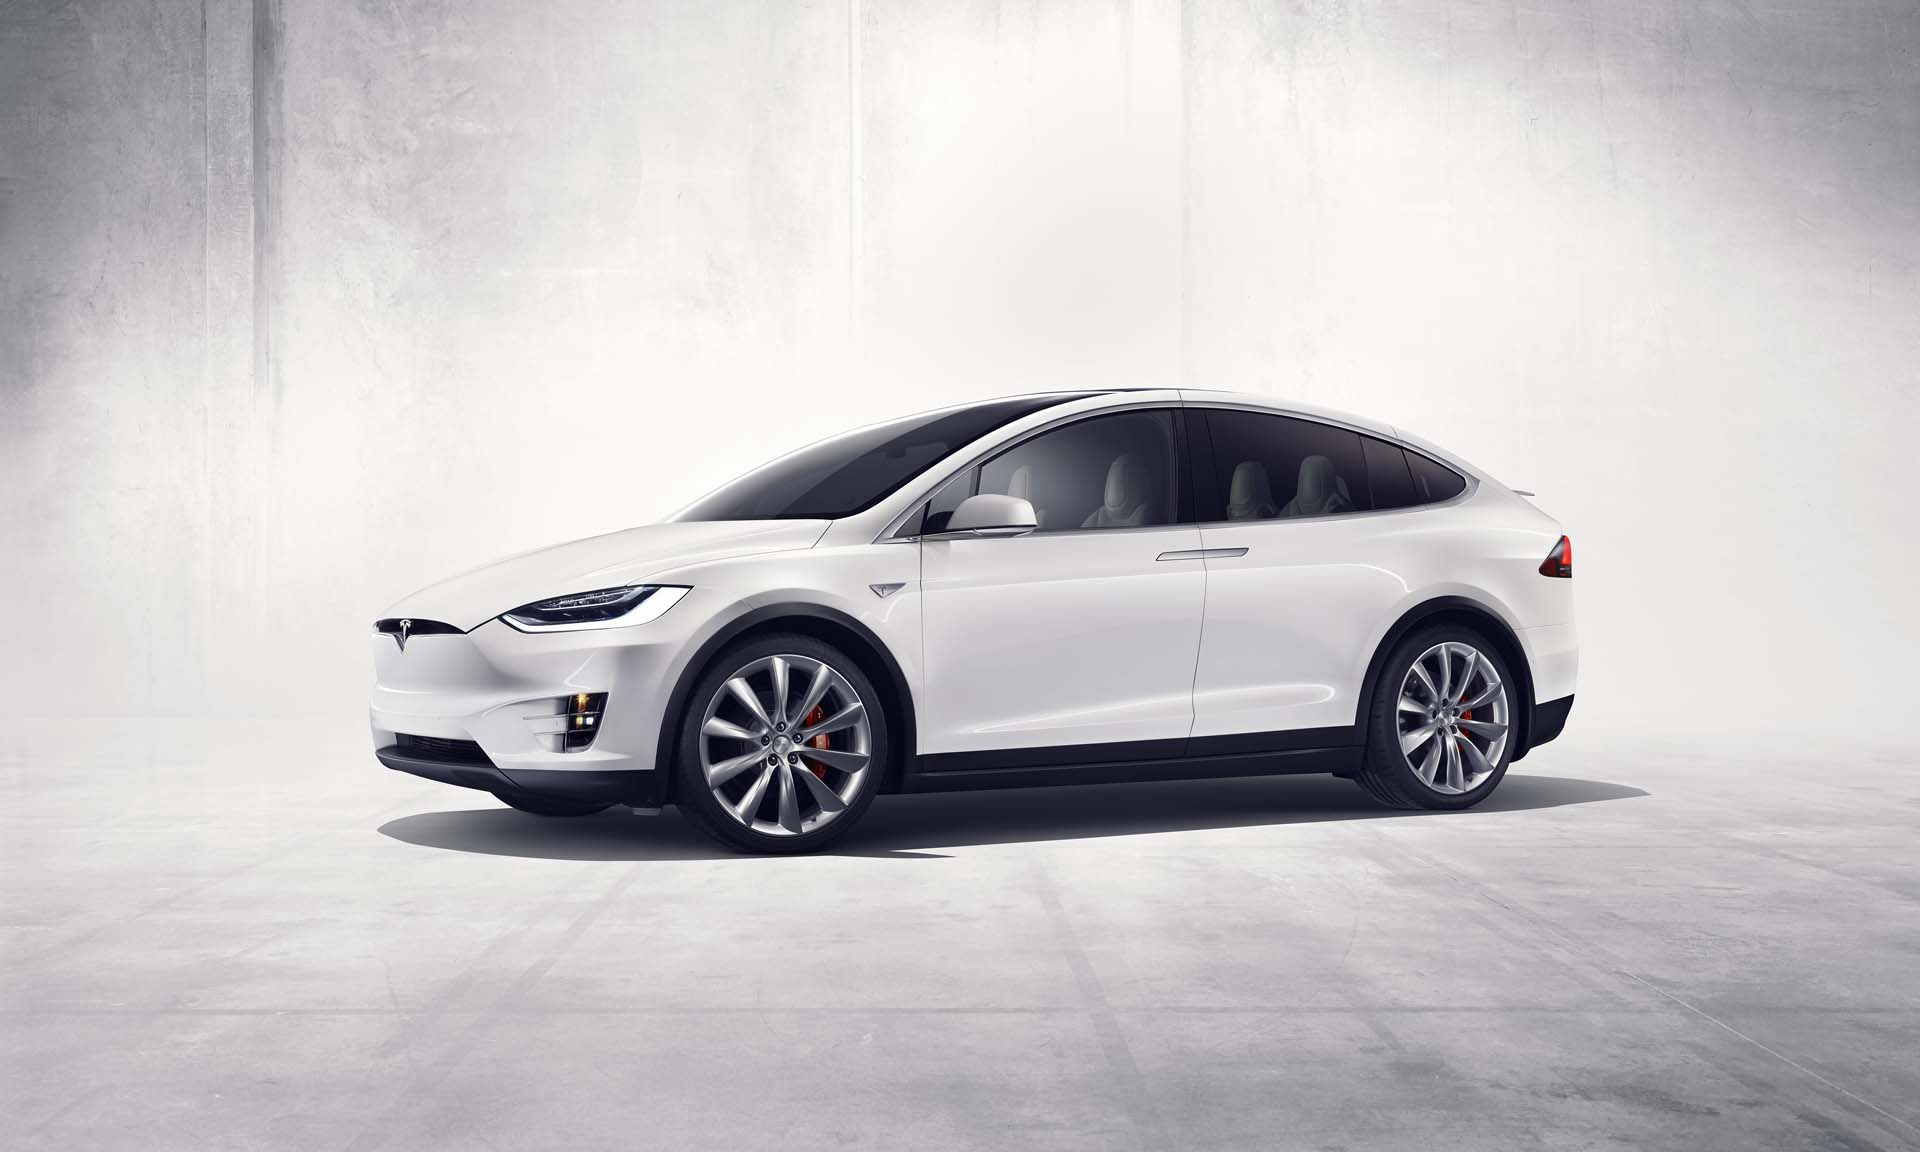 Oil-rich Dubai adds a fleet of Uber Tesla electric cars